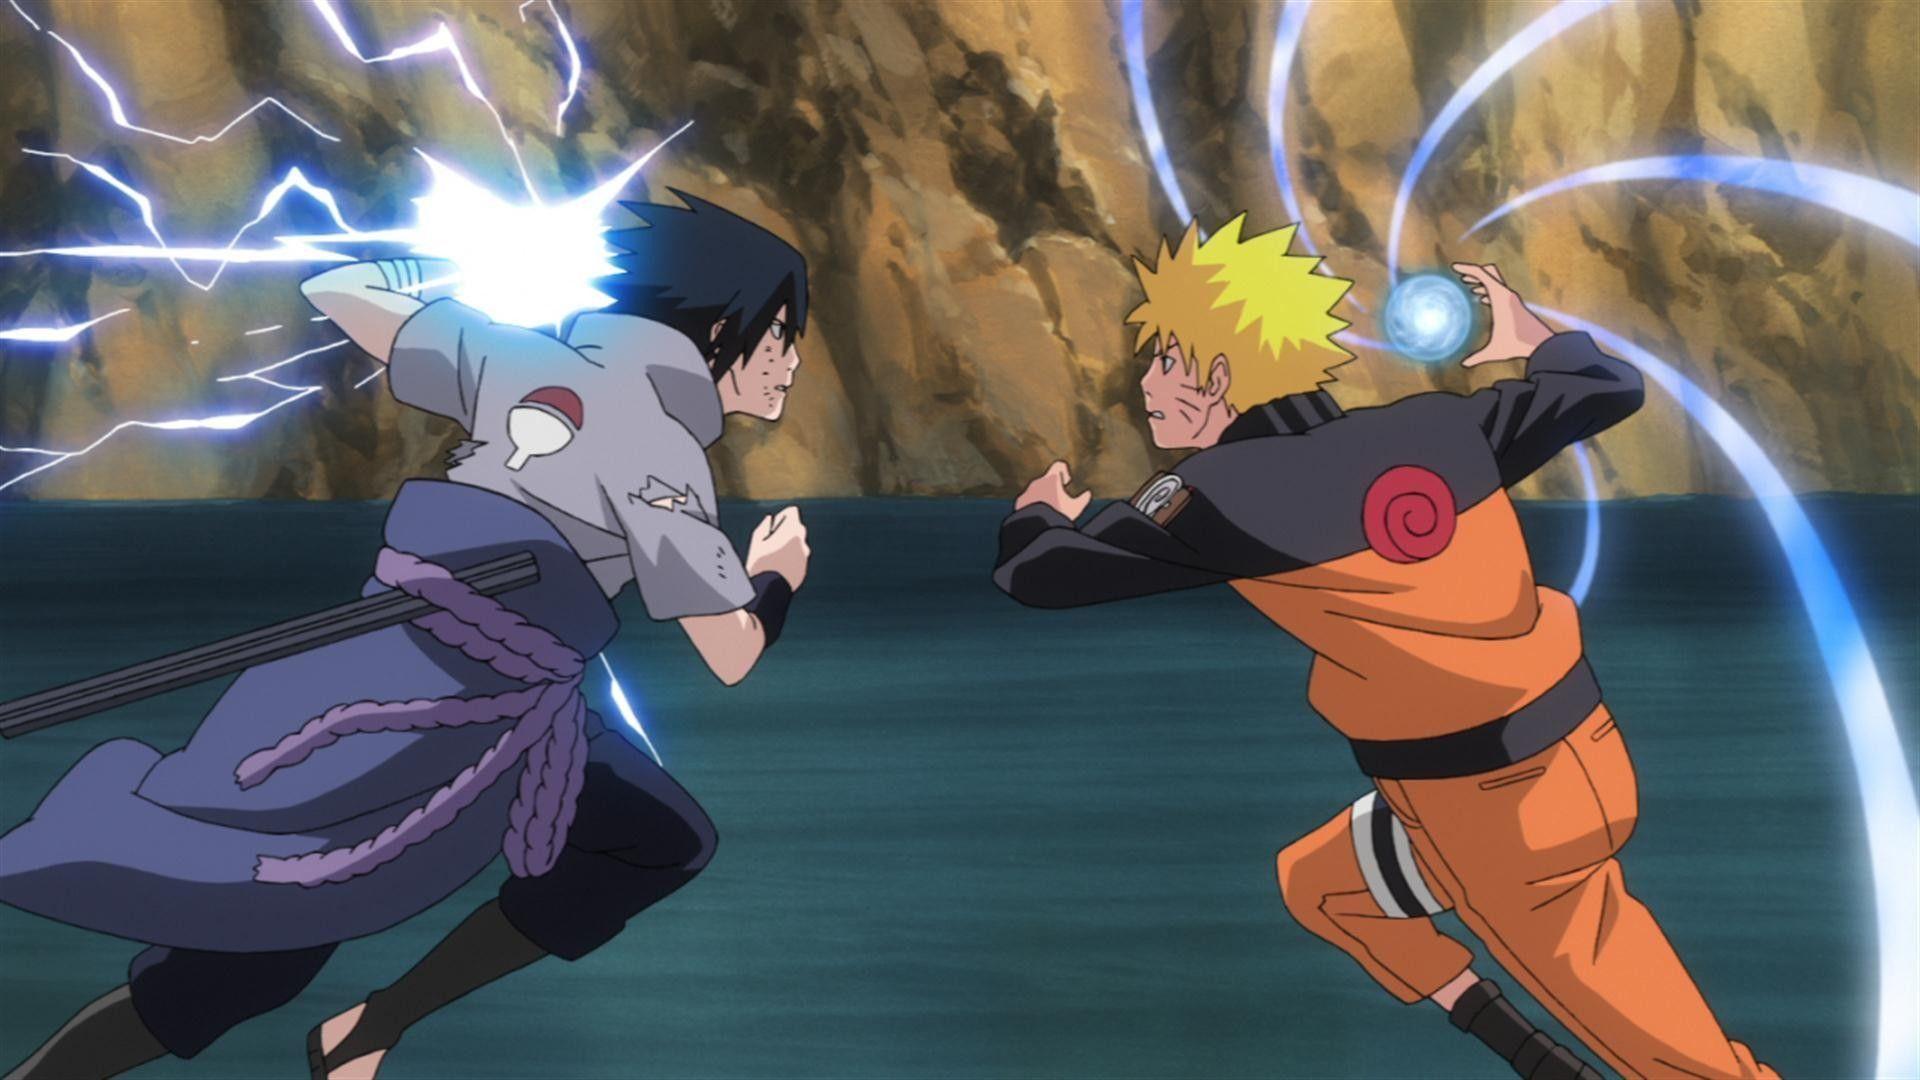 Anime Live Wallpaper Iphone Naruto Naruto and sasuke wallpaper 1920x1080